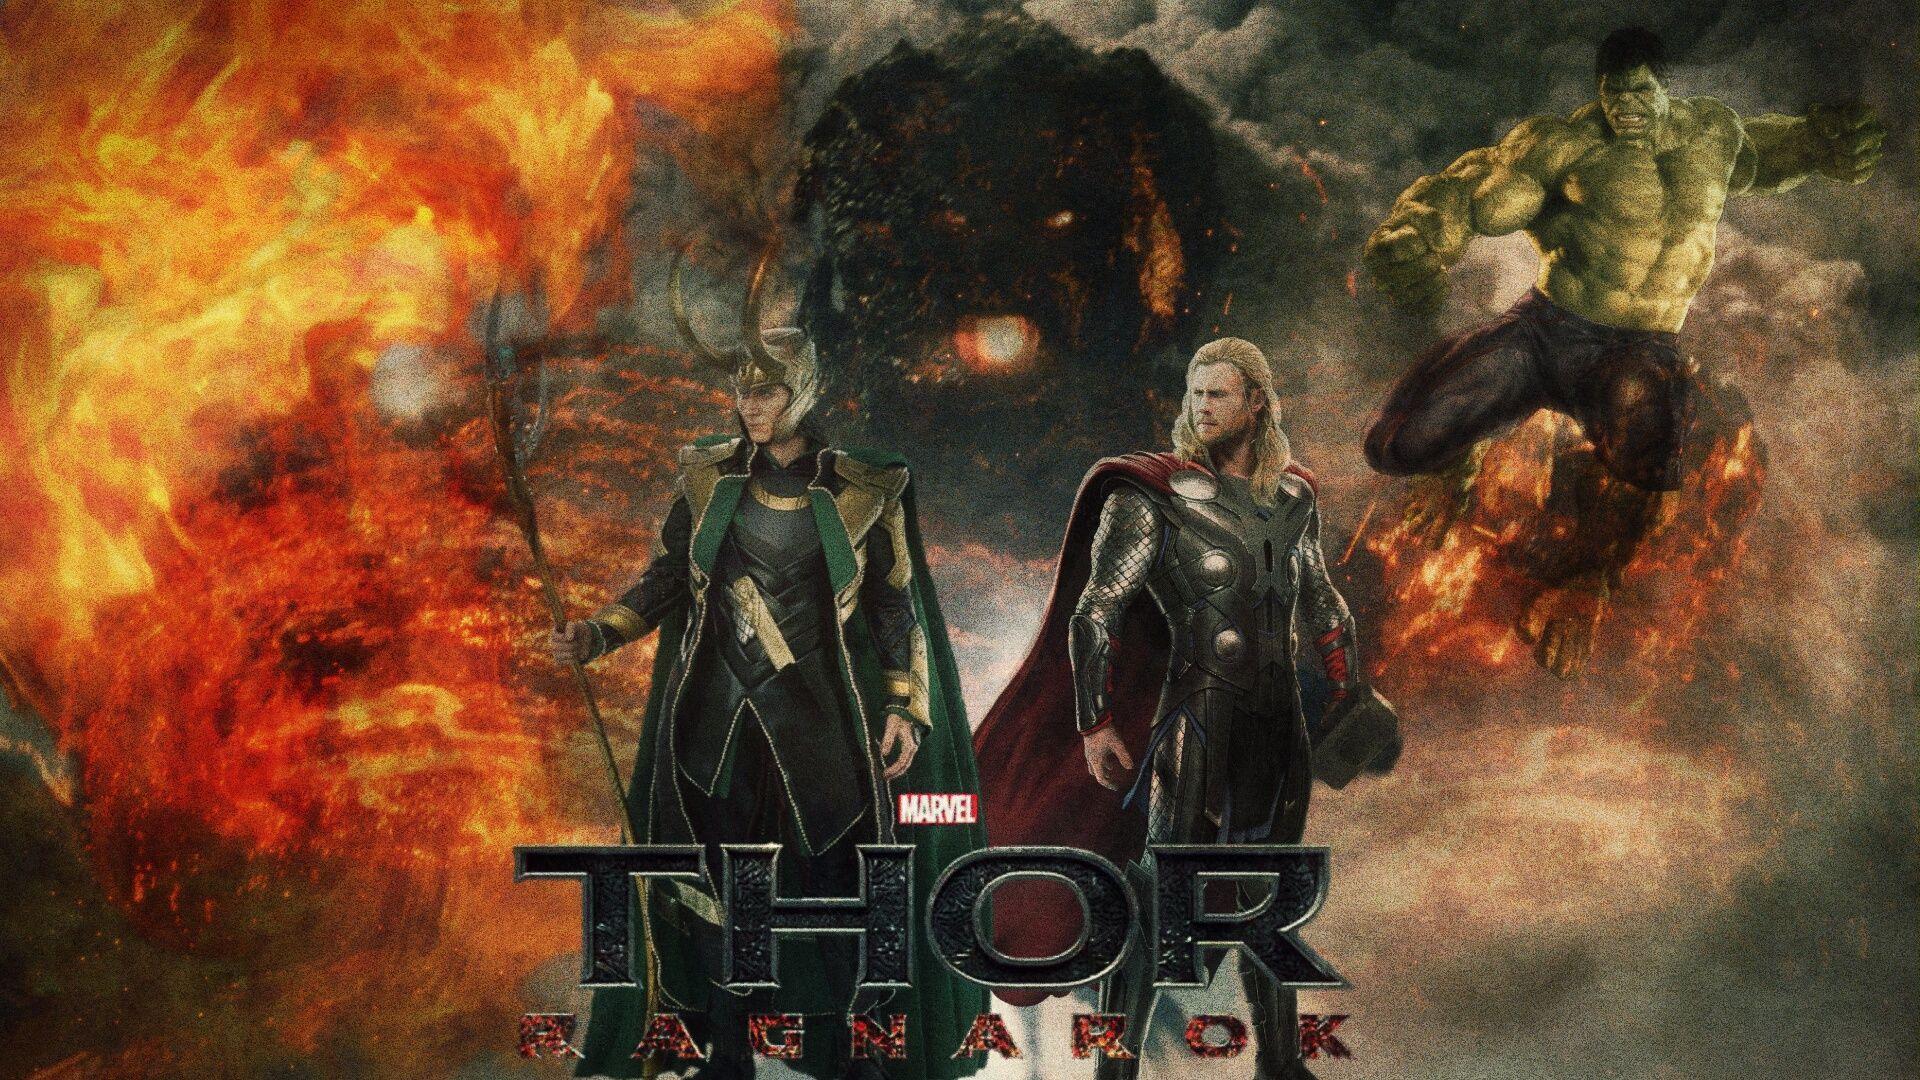 Thor Ragnarok HD Images 7 whb ThorRagnarokHDImages ThorRagnarok